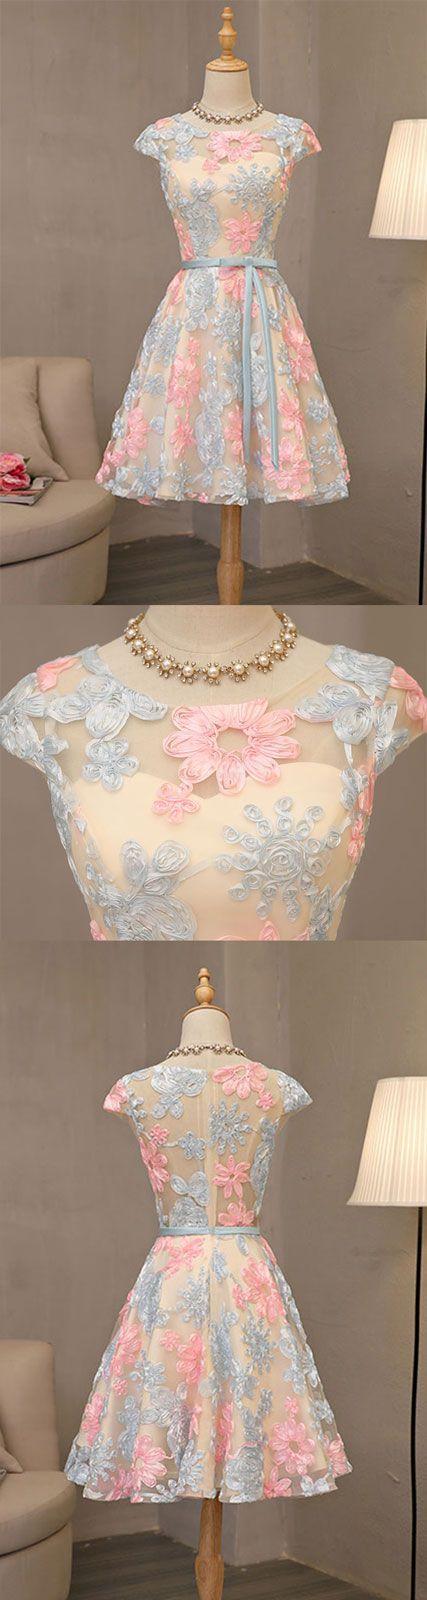 cute round neck short prom dress, cute homecoming dress